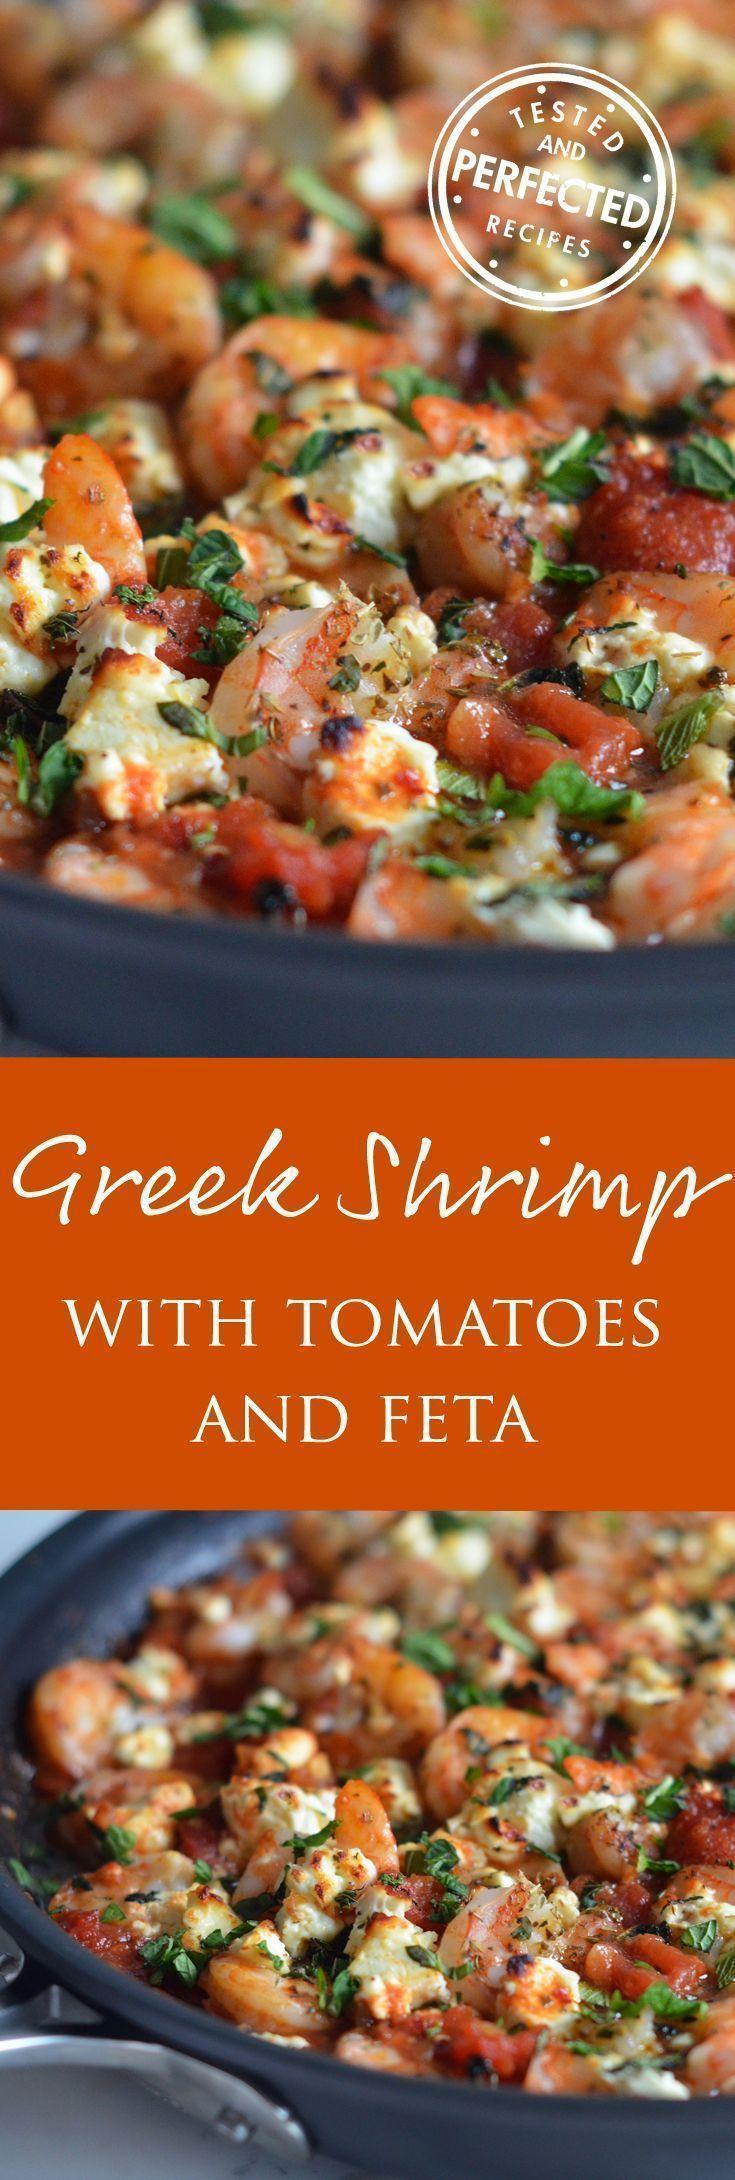 Greek Shrimp with Tomatoes & Feta #greek #shrimprecipes #greekshrimp